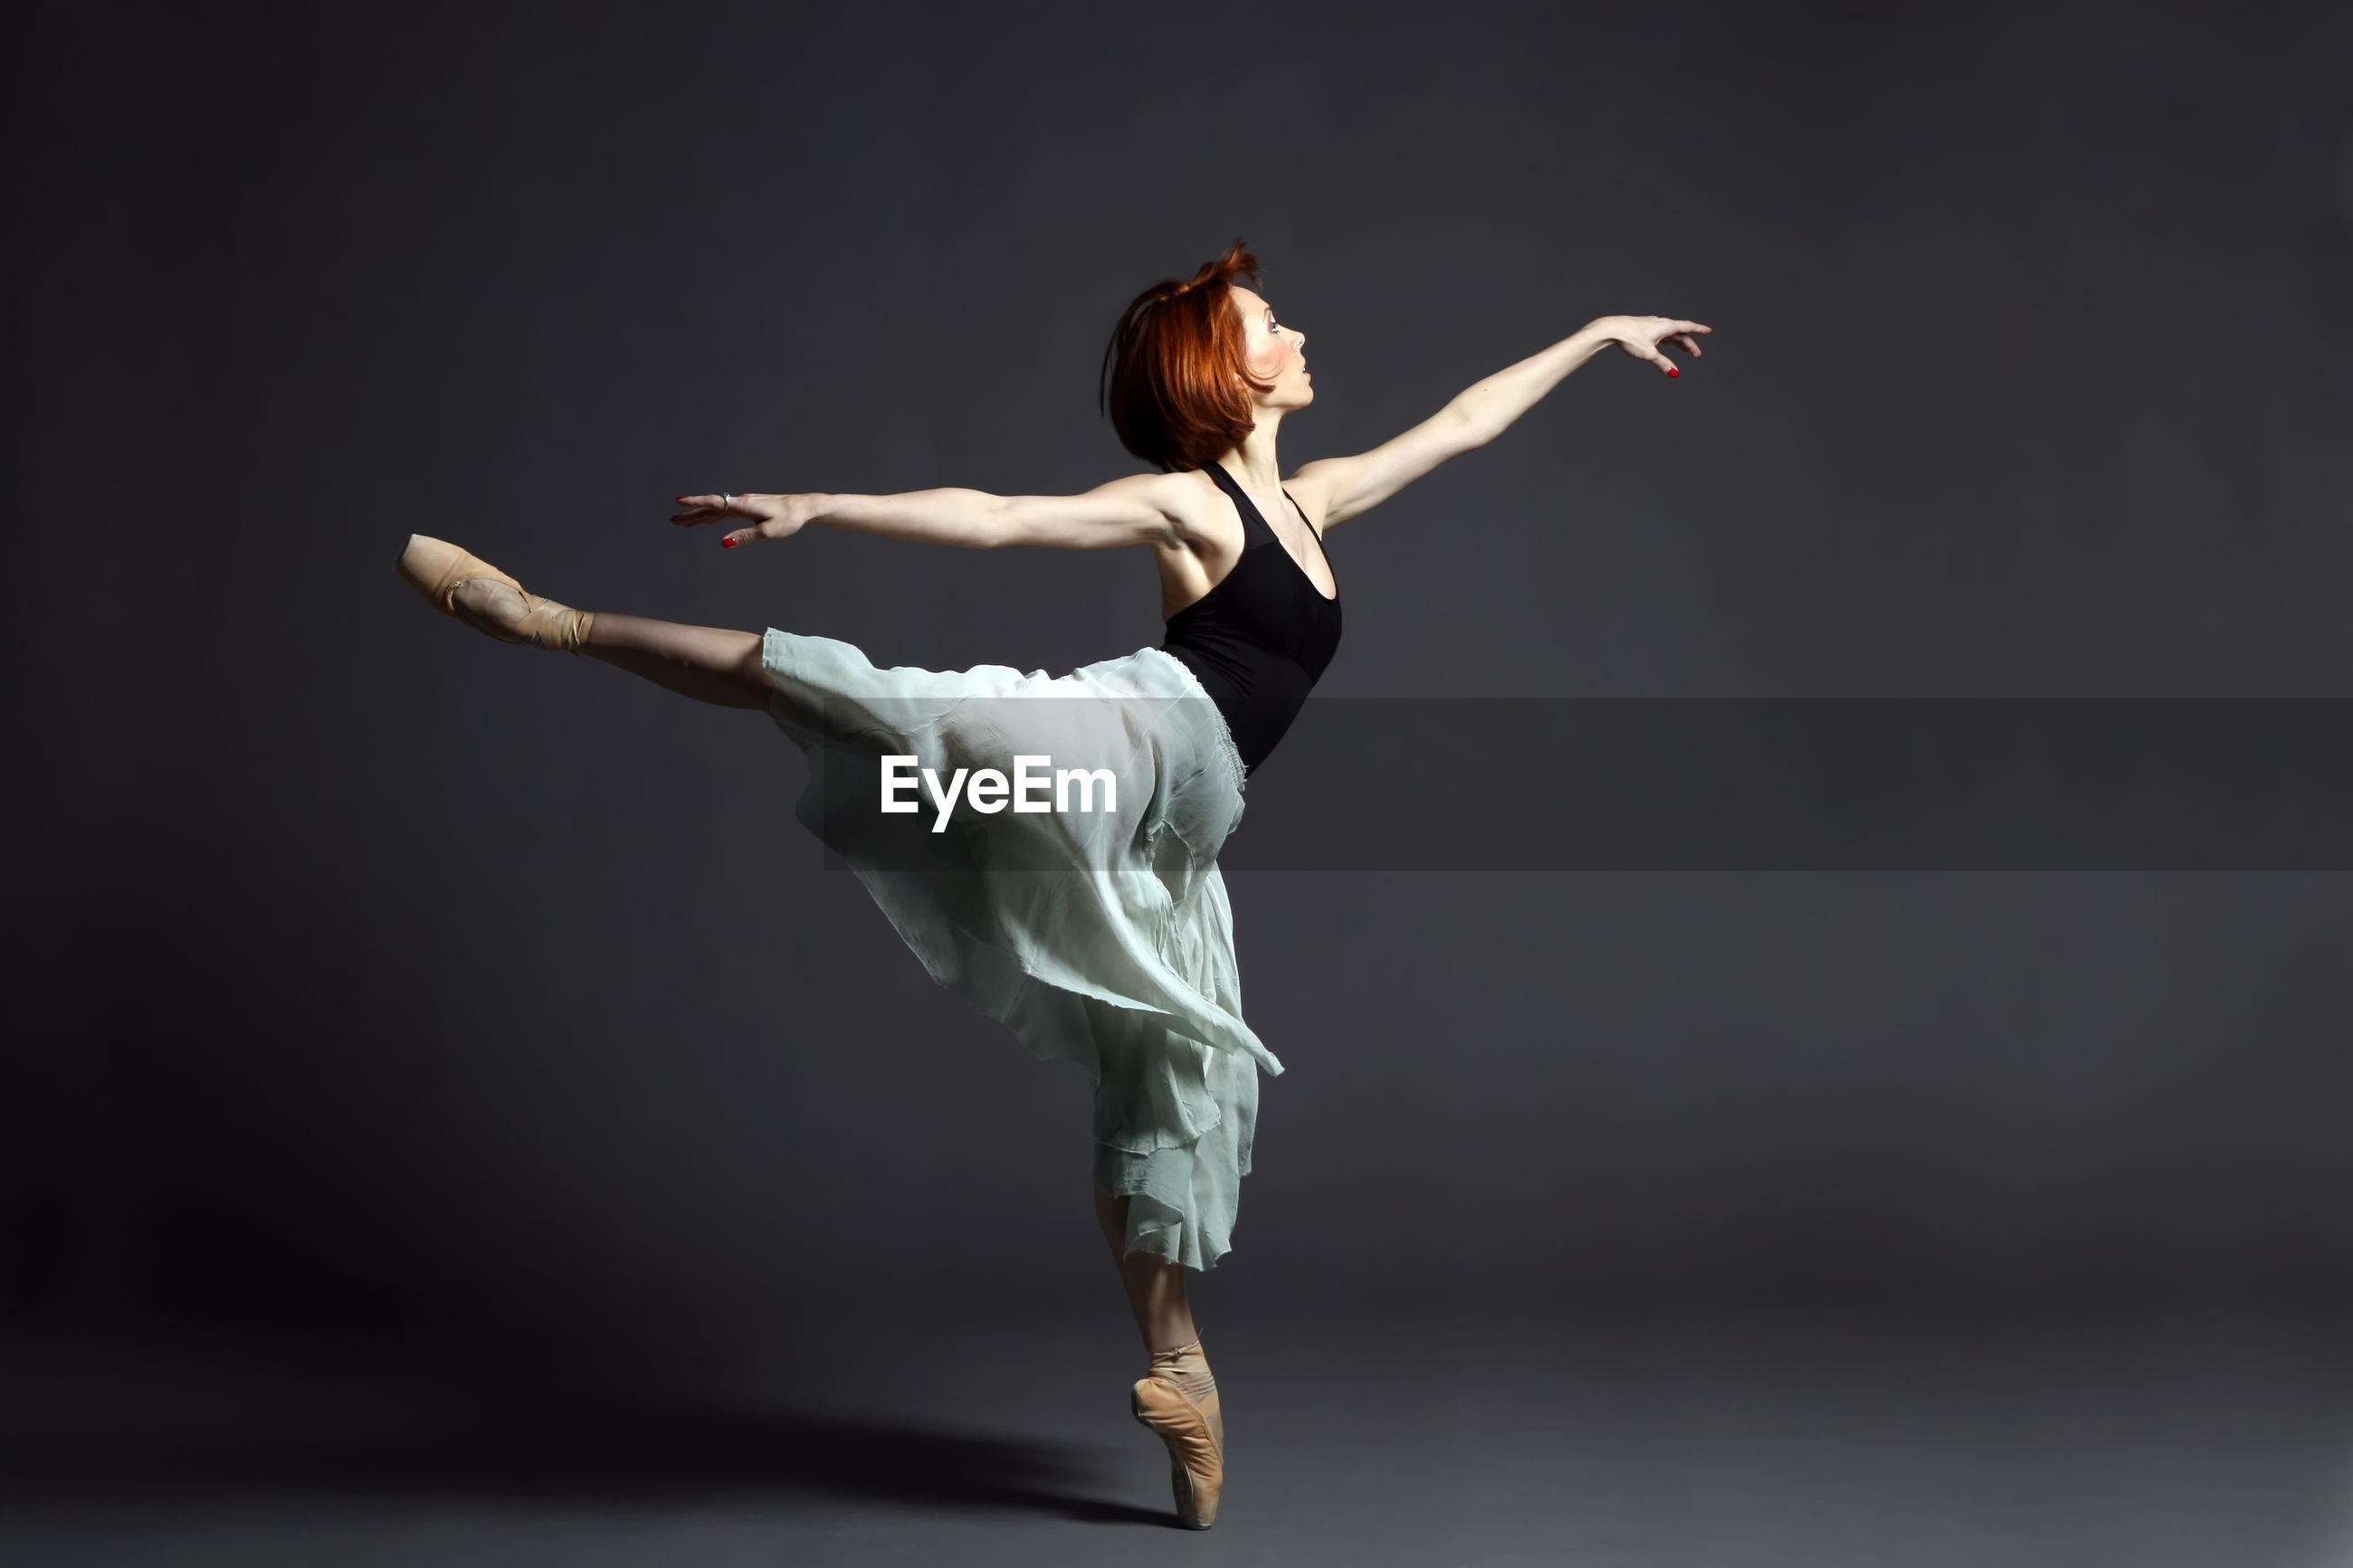 Ballerina dancing against gray backdrop